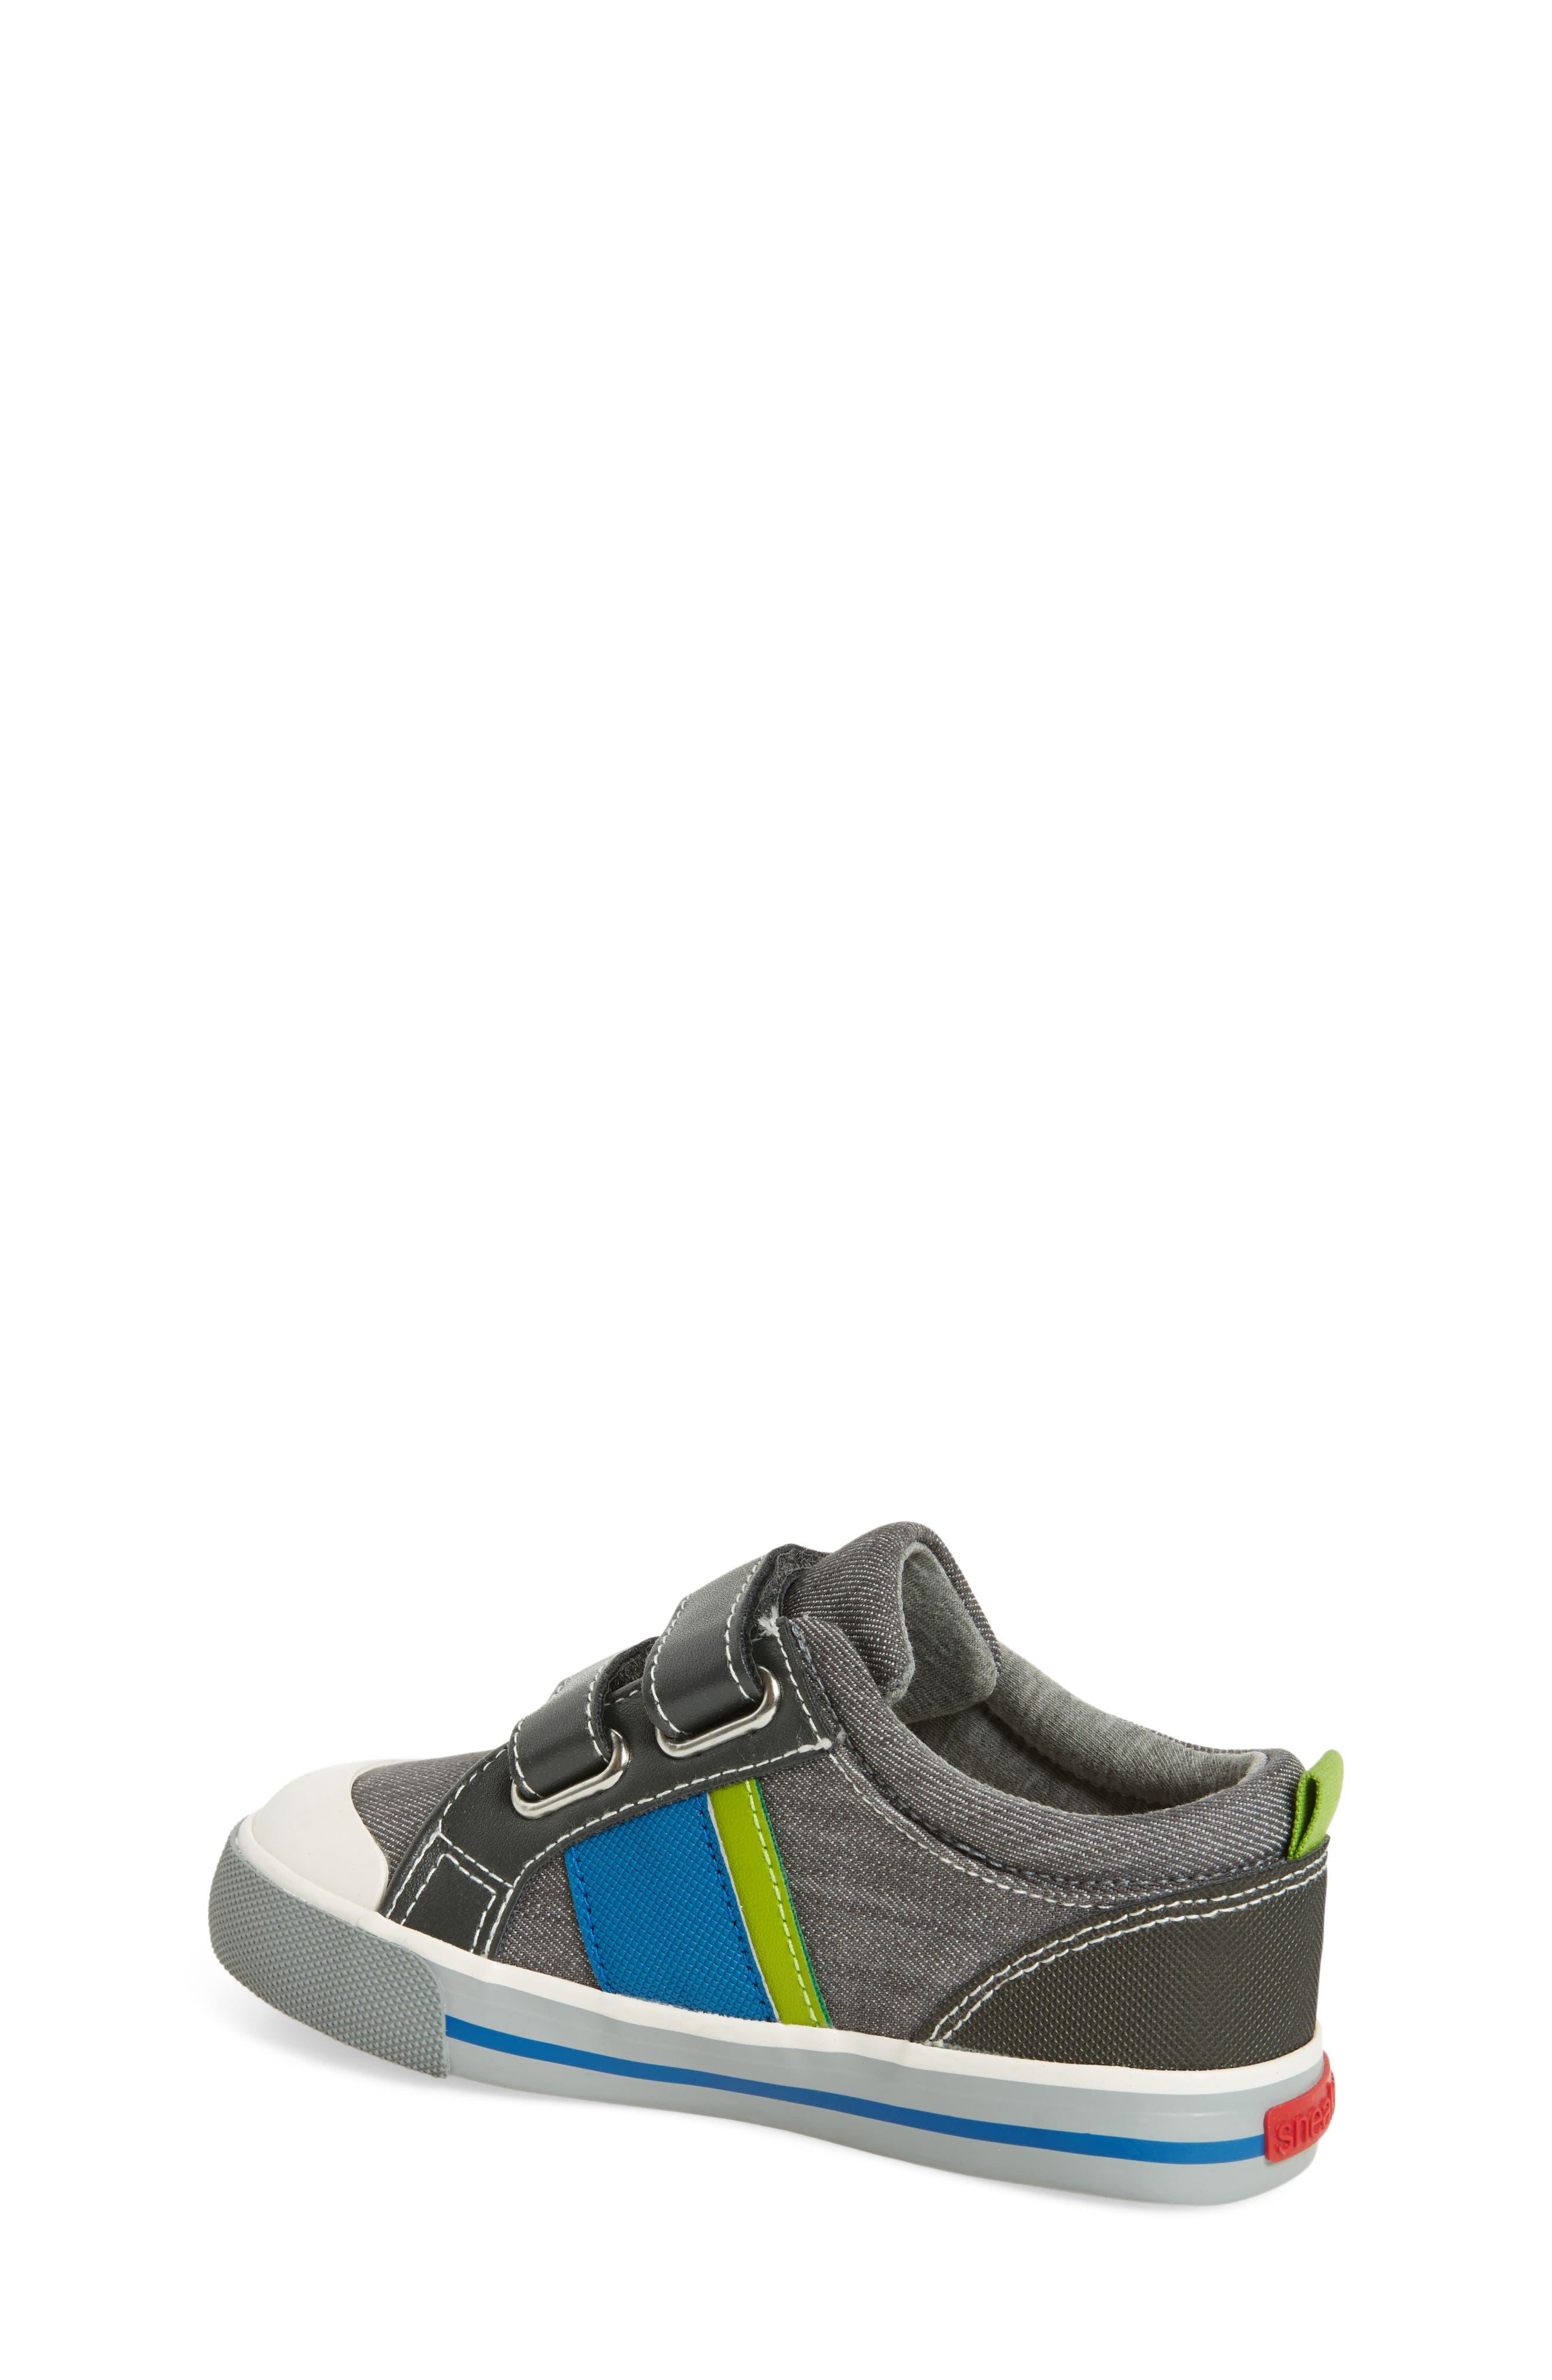 Russell Sneaker,                             Alternate thumbnail 2, color,                             020